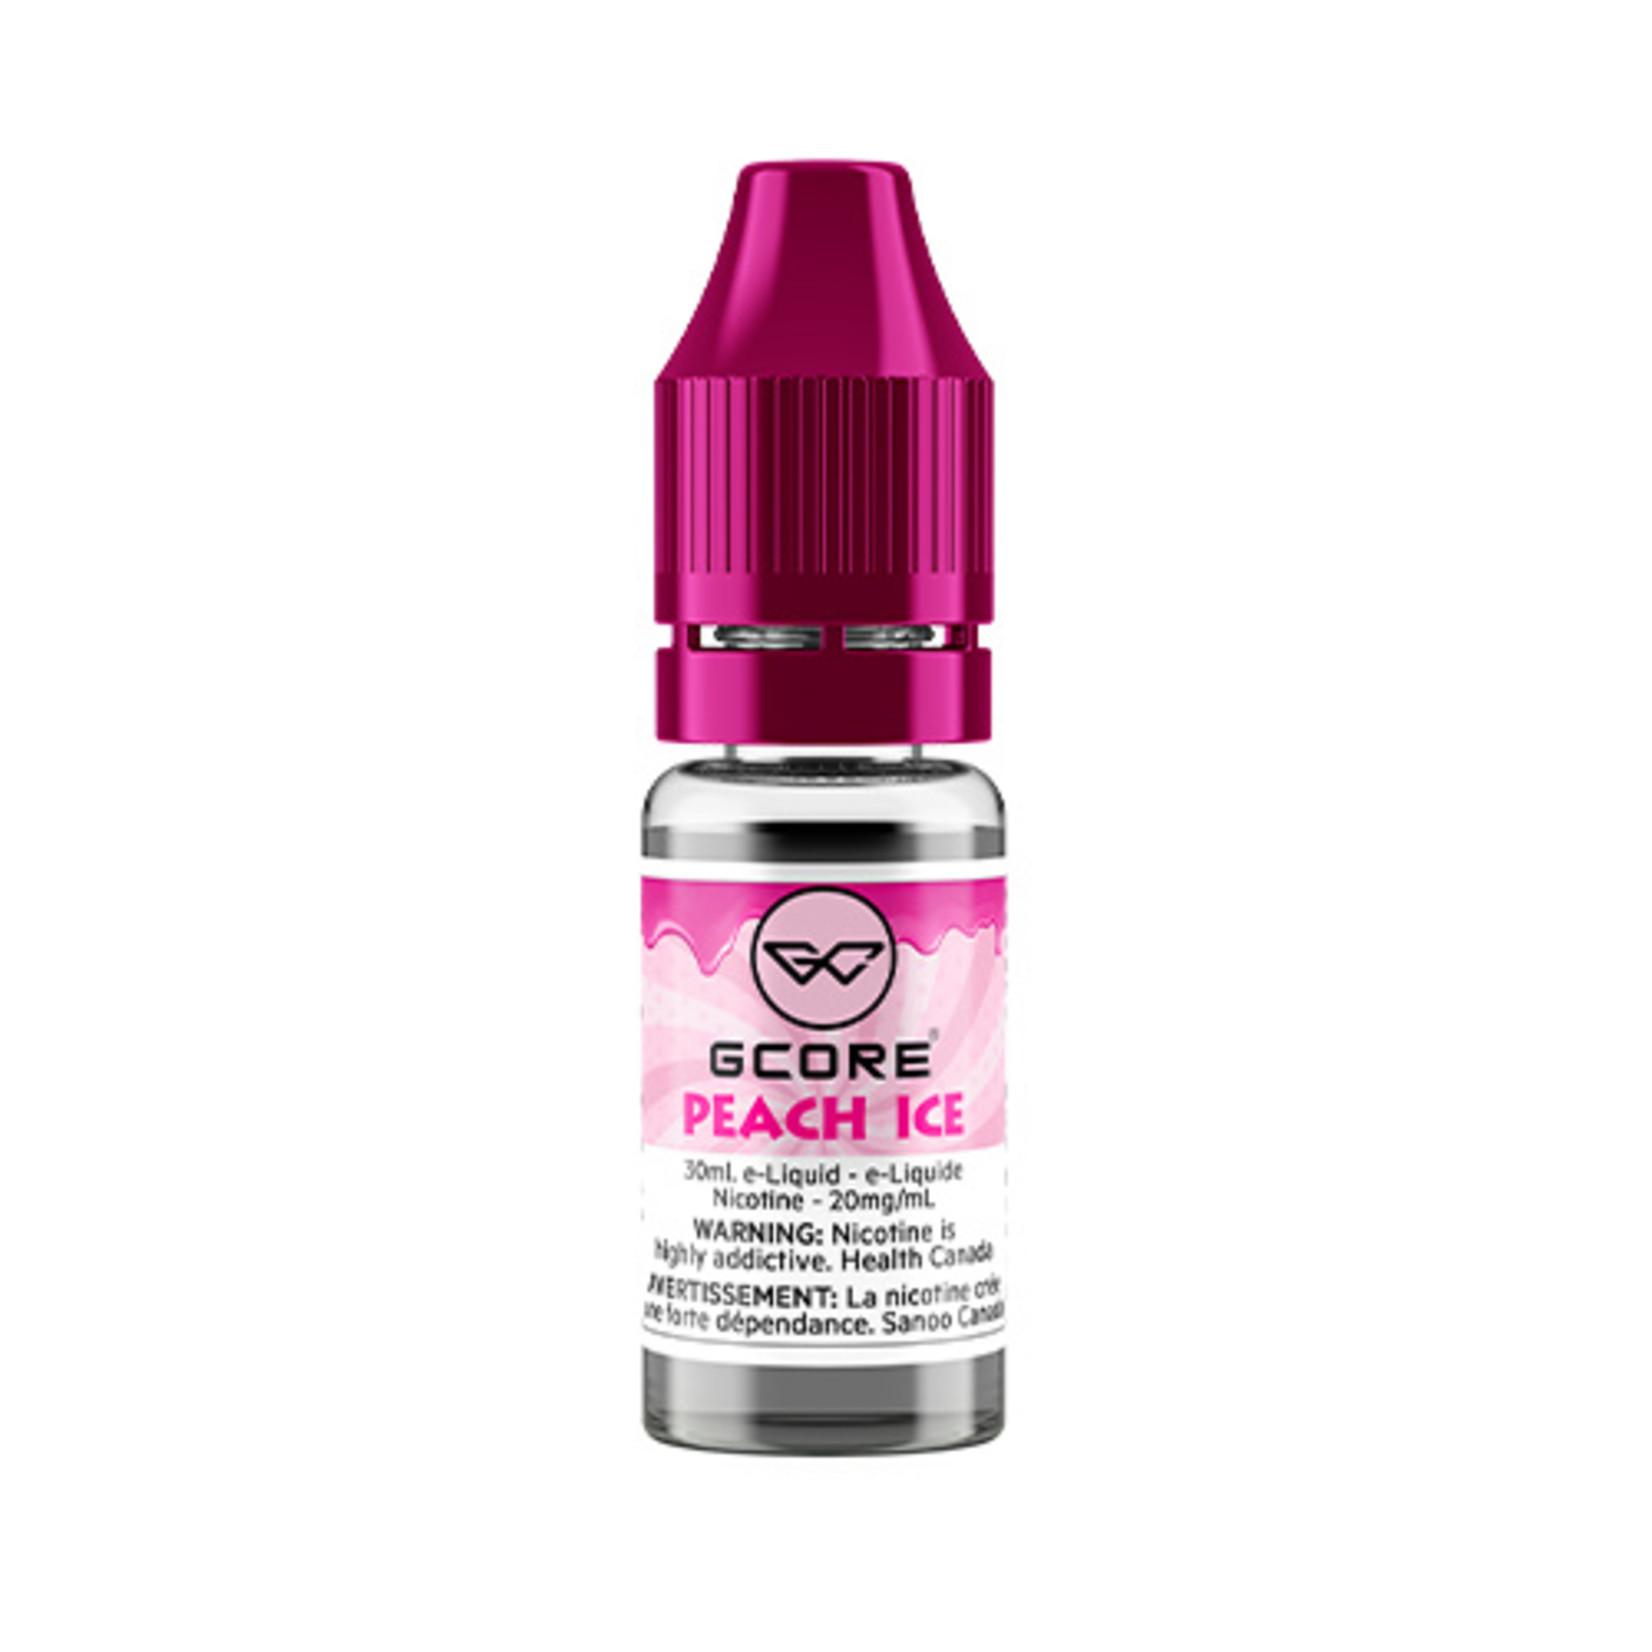 Gcore Vape Peach Ice Juice